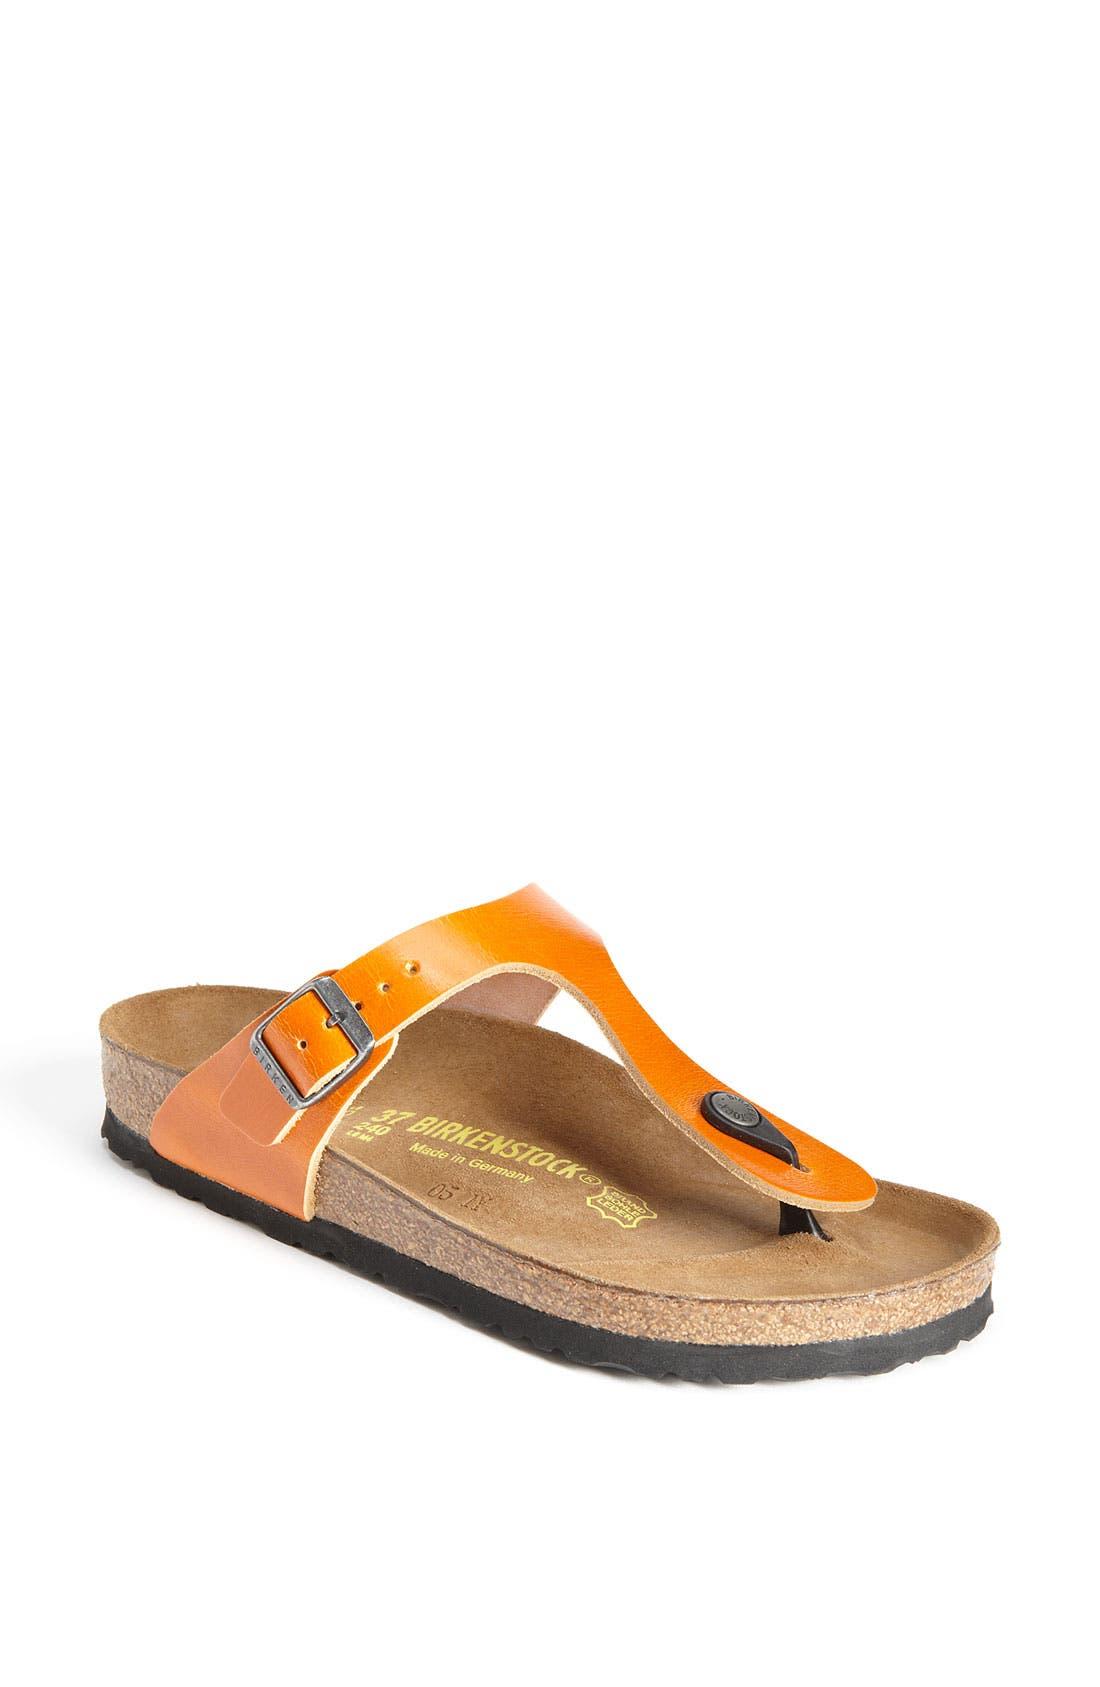 Alternate Image 1 Selected - Birkenstock 'Gizeh' Sandal (Exclusive)